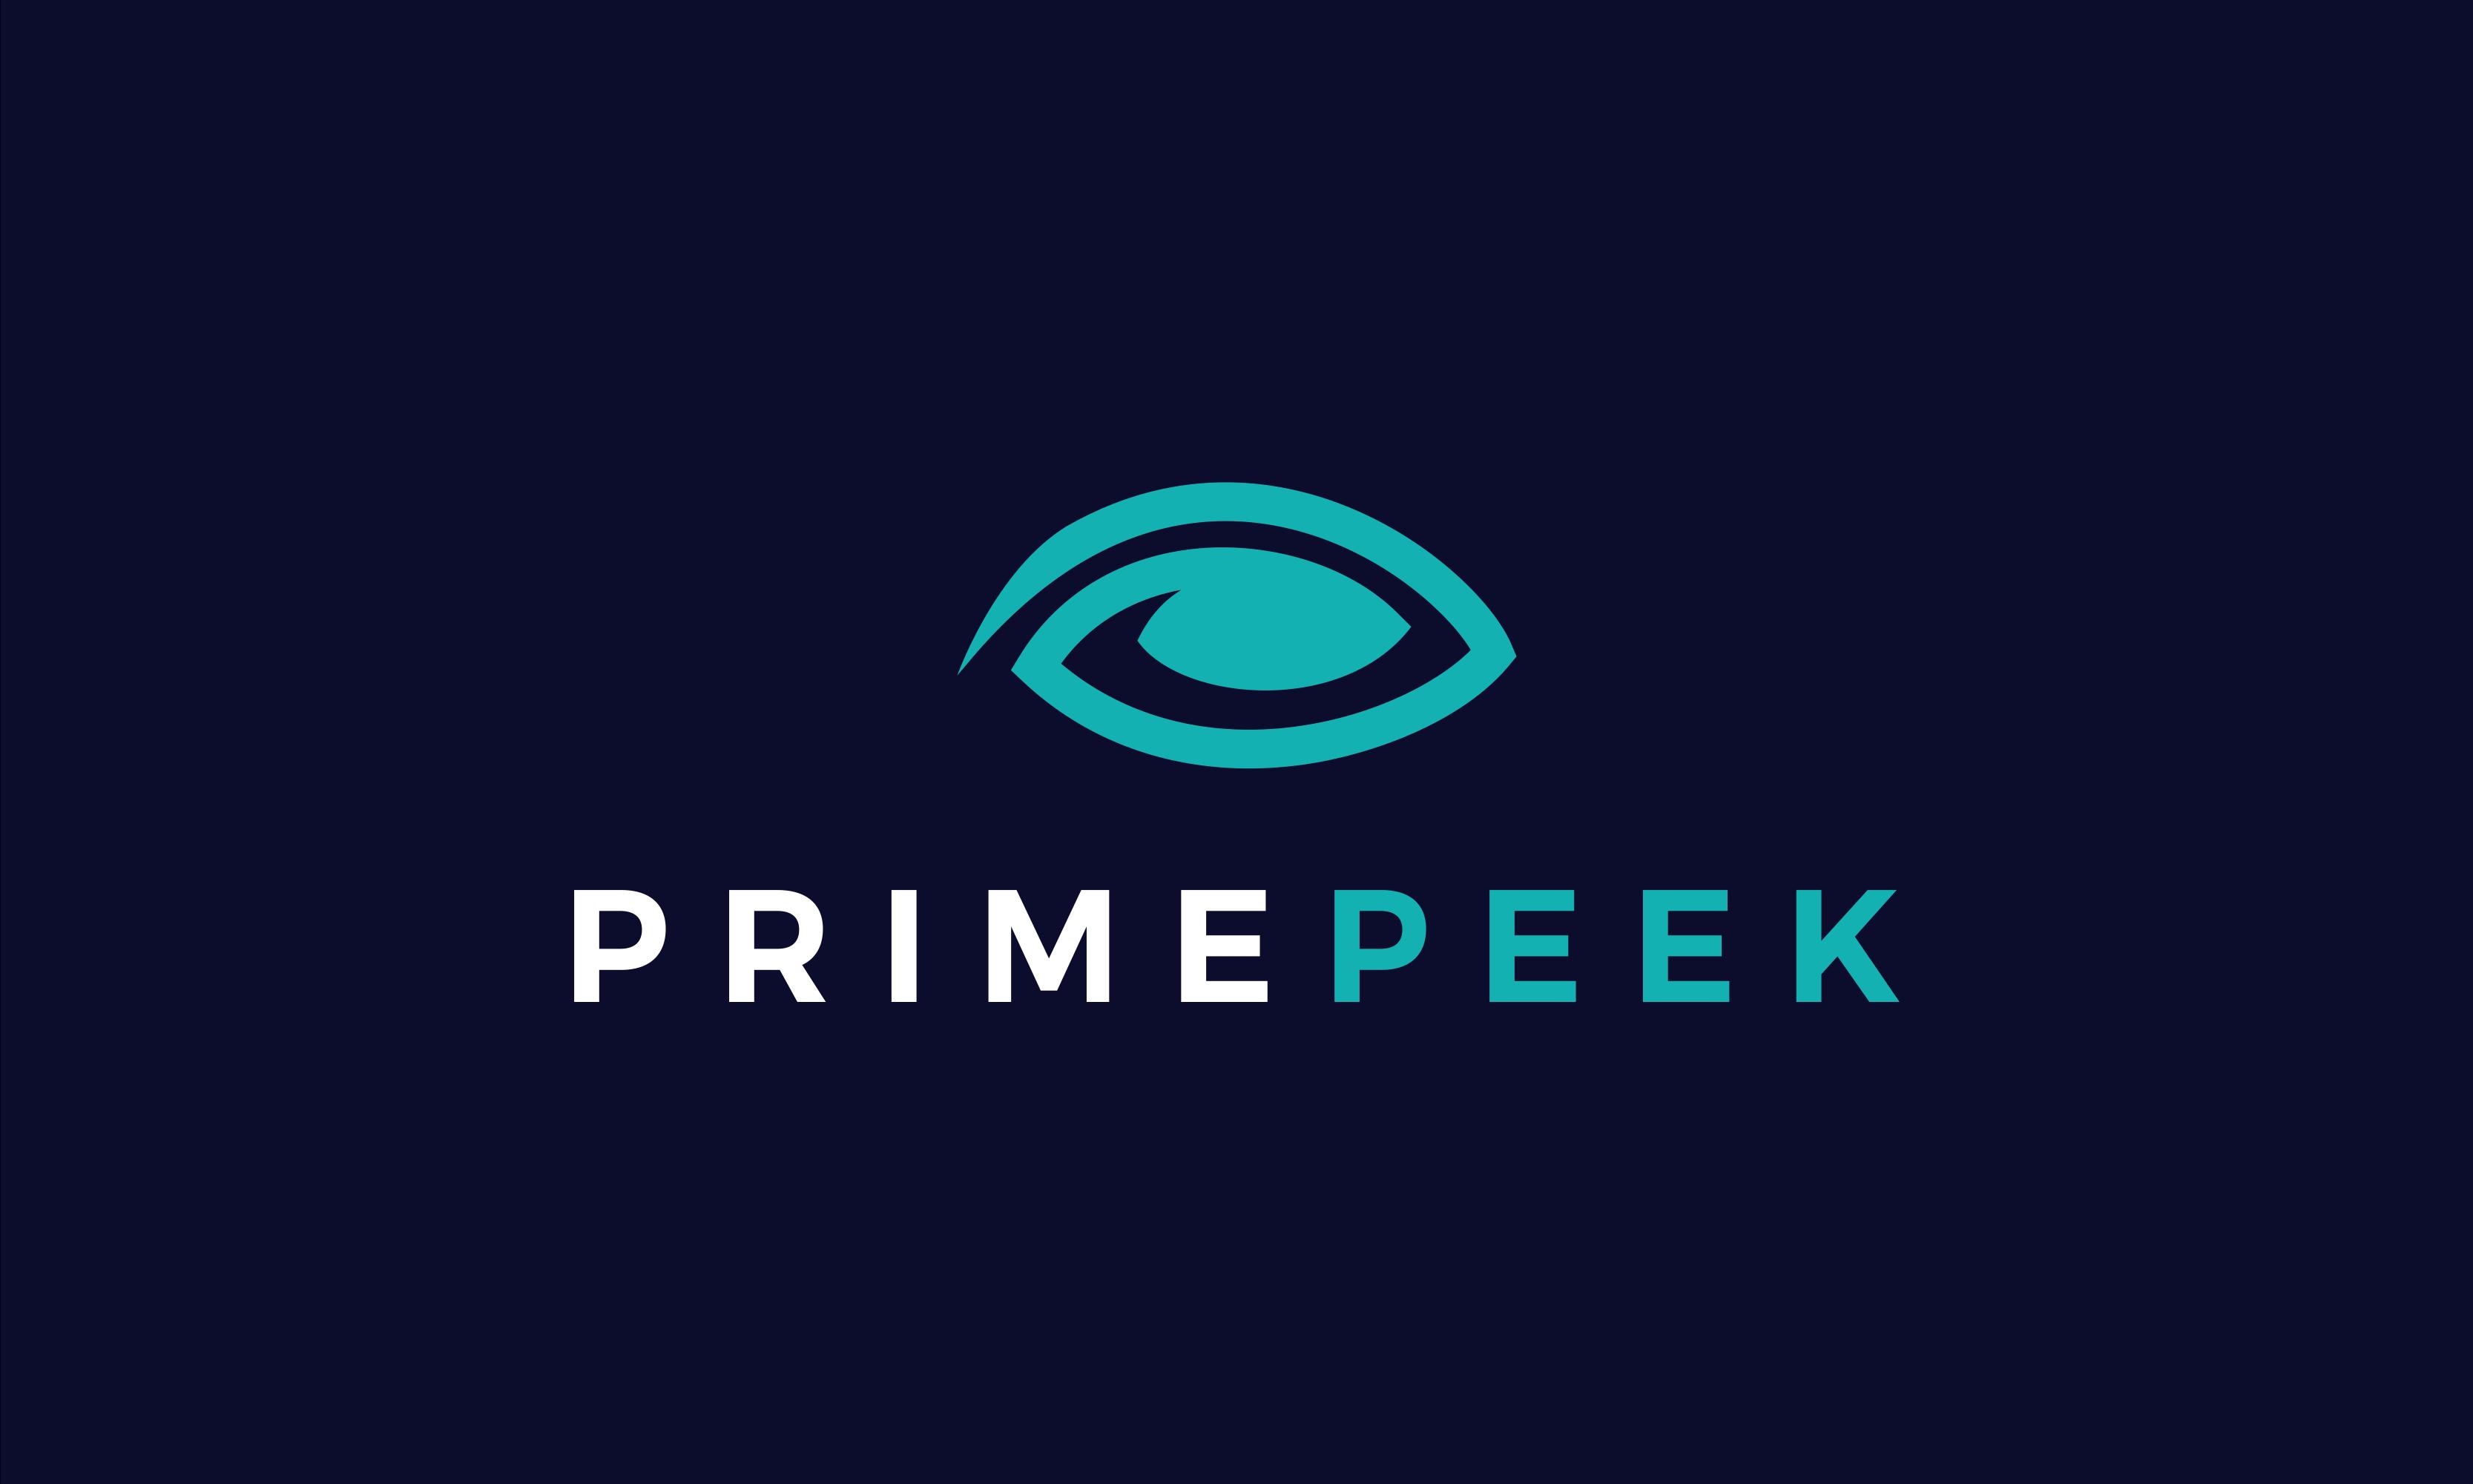 Primepeek